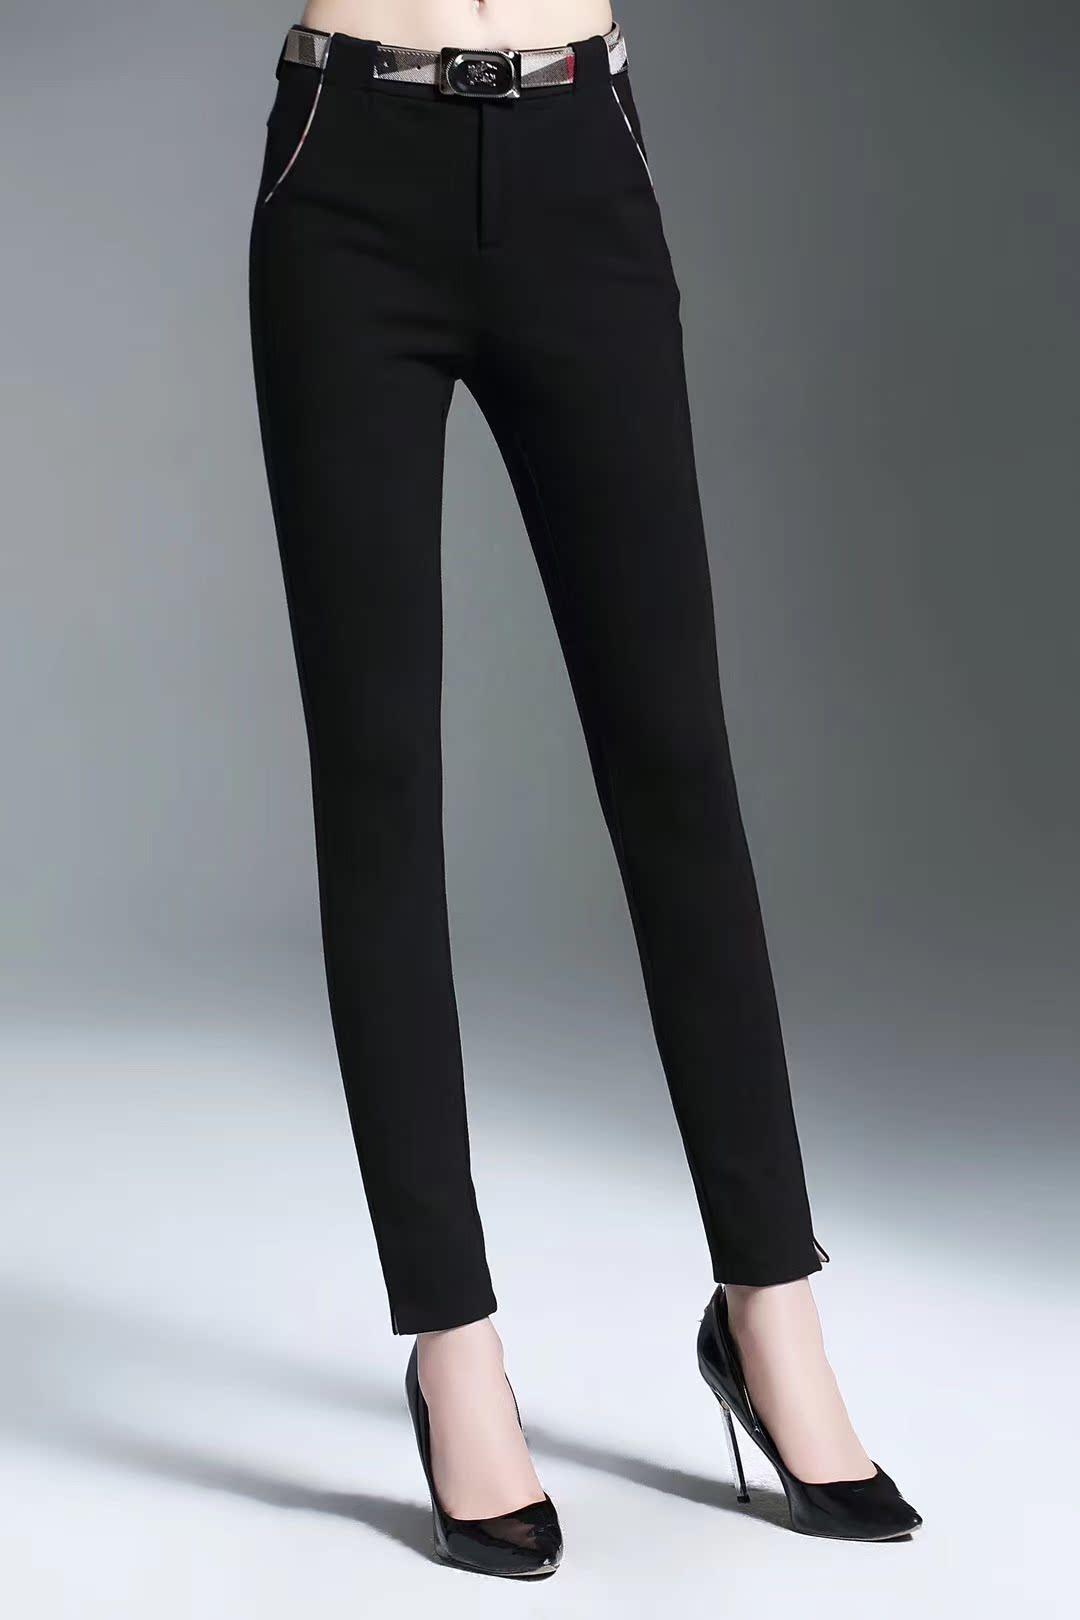 BIDITIRRY正品裤子2018秋冬新款小脚裤女罗马棉弹力修身显瘦长裤